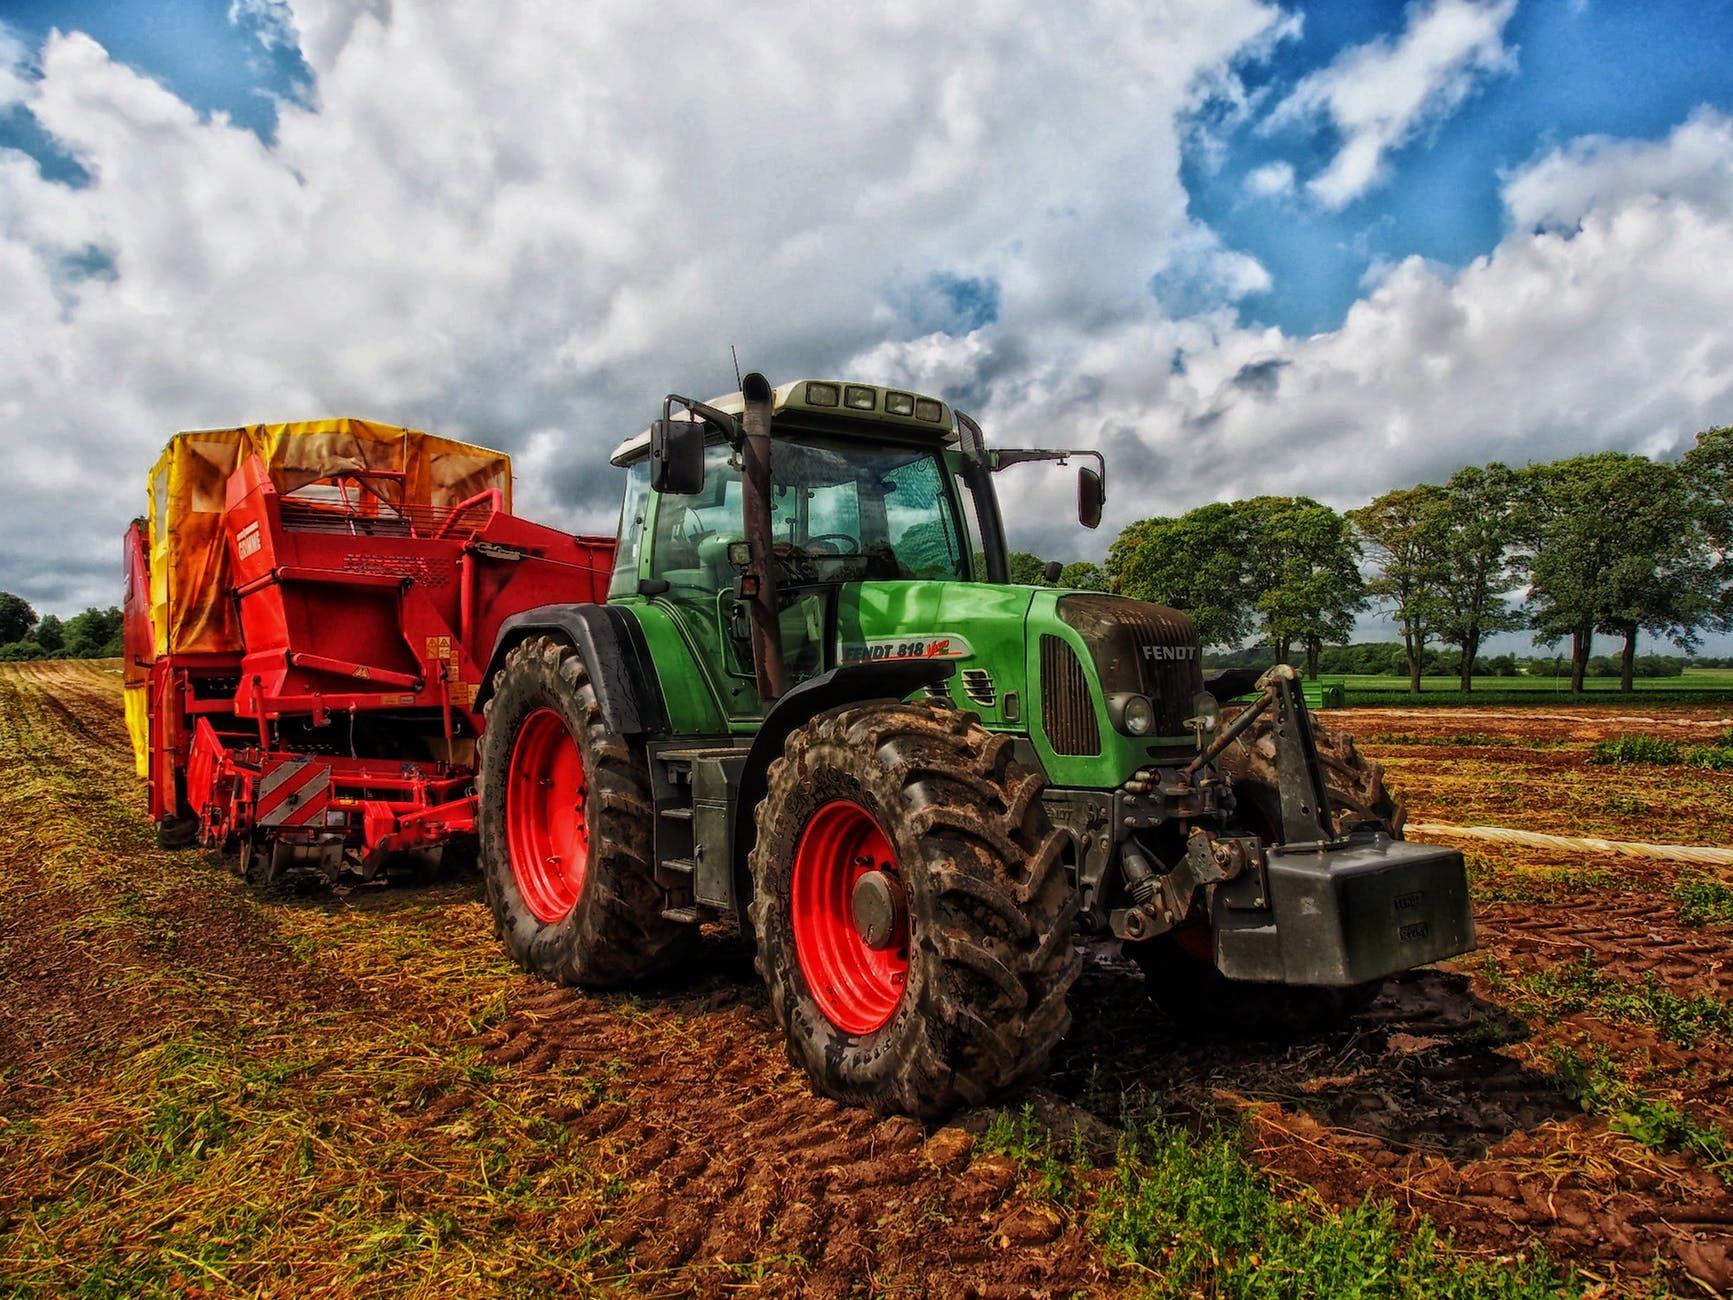 tractor-grain-mixer-rural-denmark-53622.jpeg